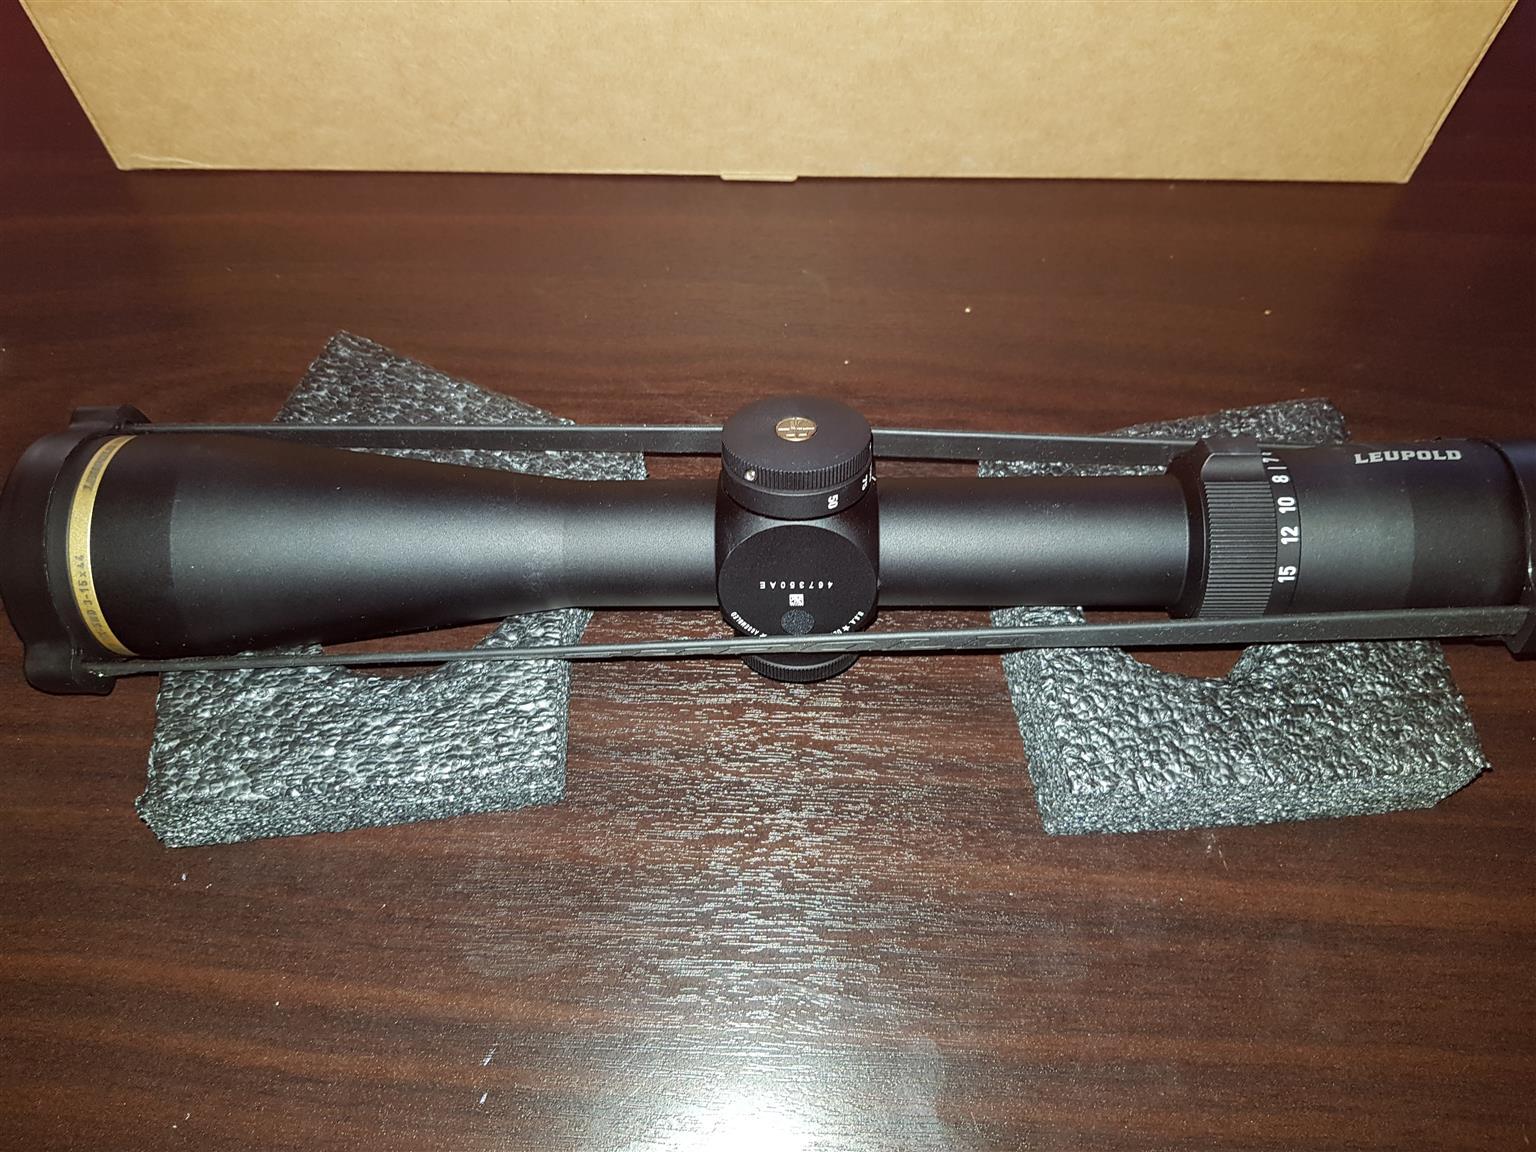 Leopold scope vx5hd 3-15x44 cds zl2 matte 30mm